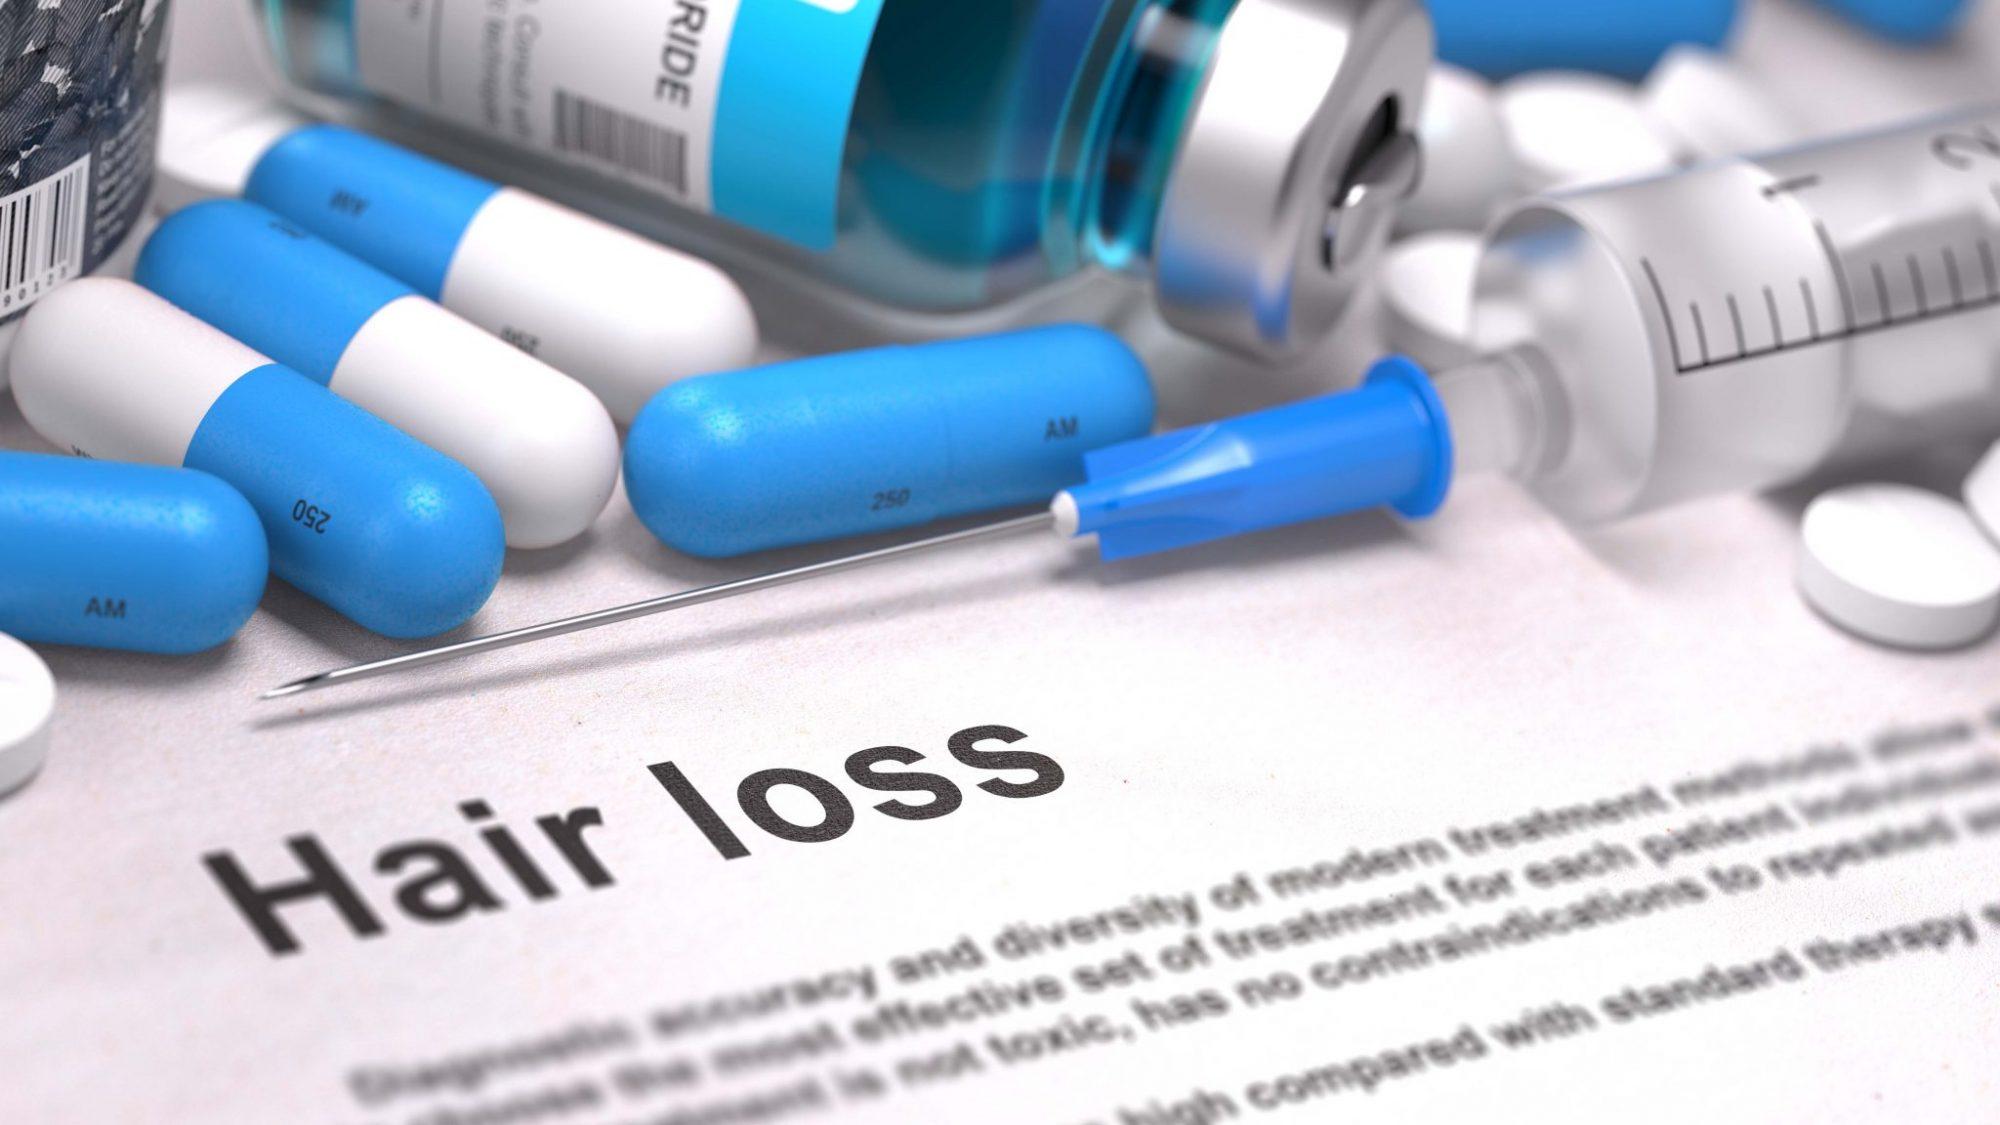 Finasteride - Hair Loss